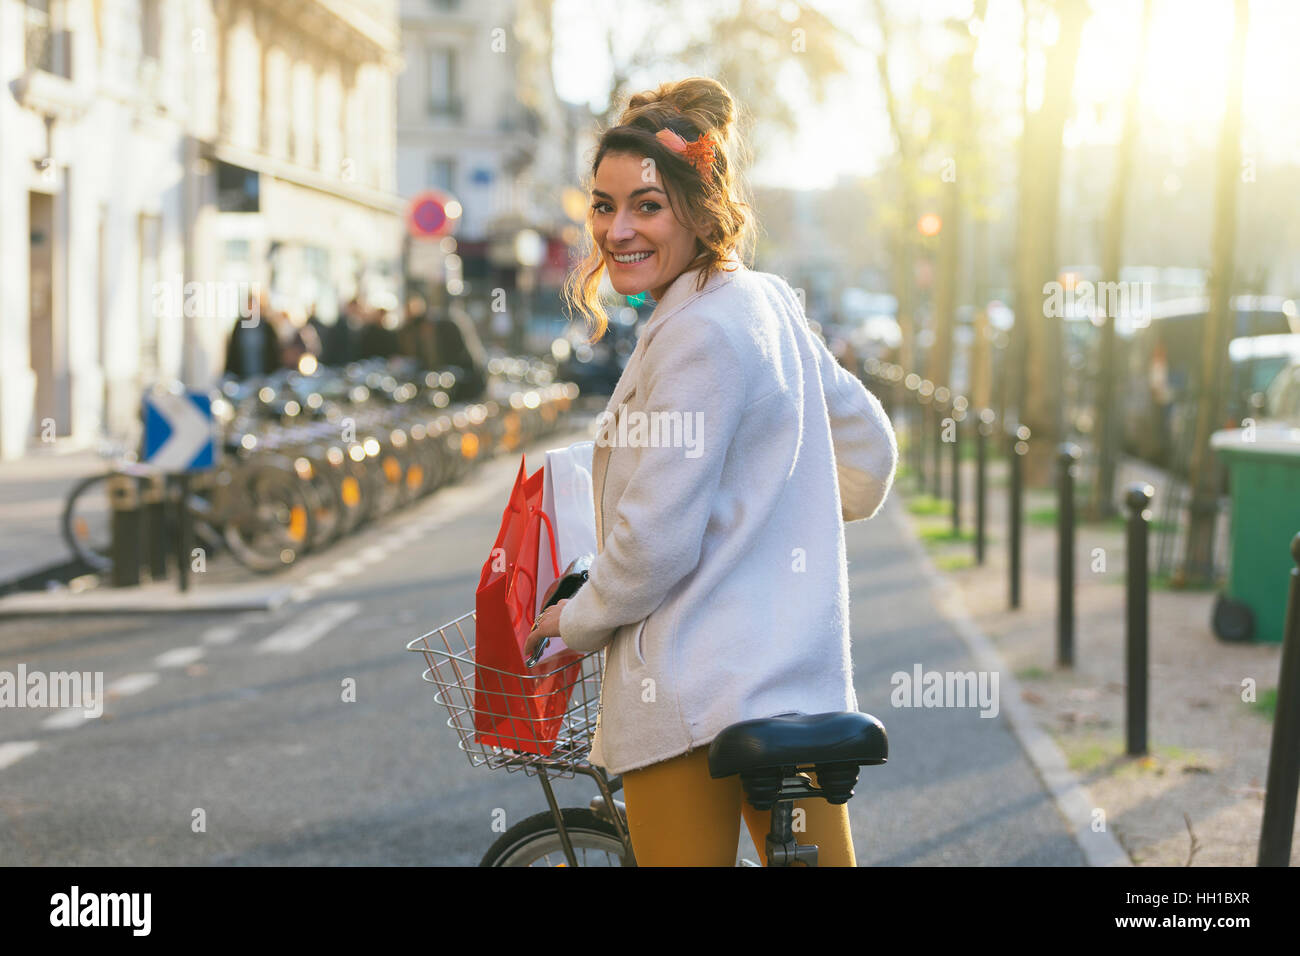 Paris, Frau Reiten ein Vélib in Paris Straße Stockbild